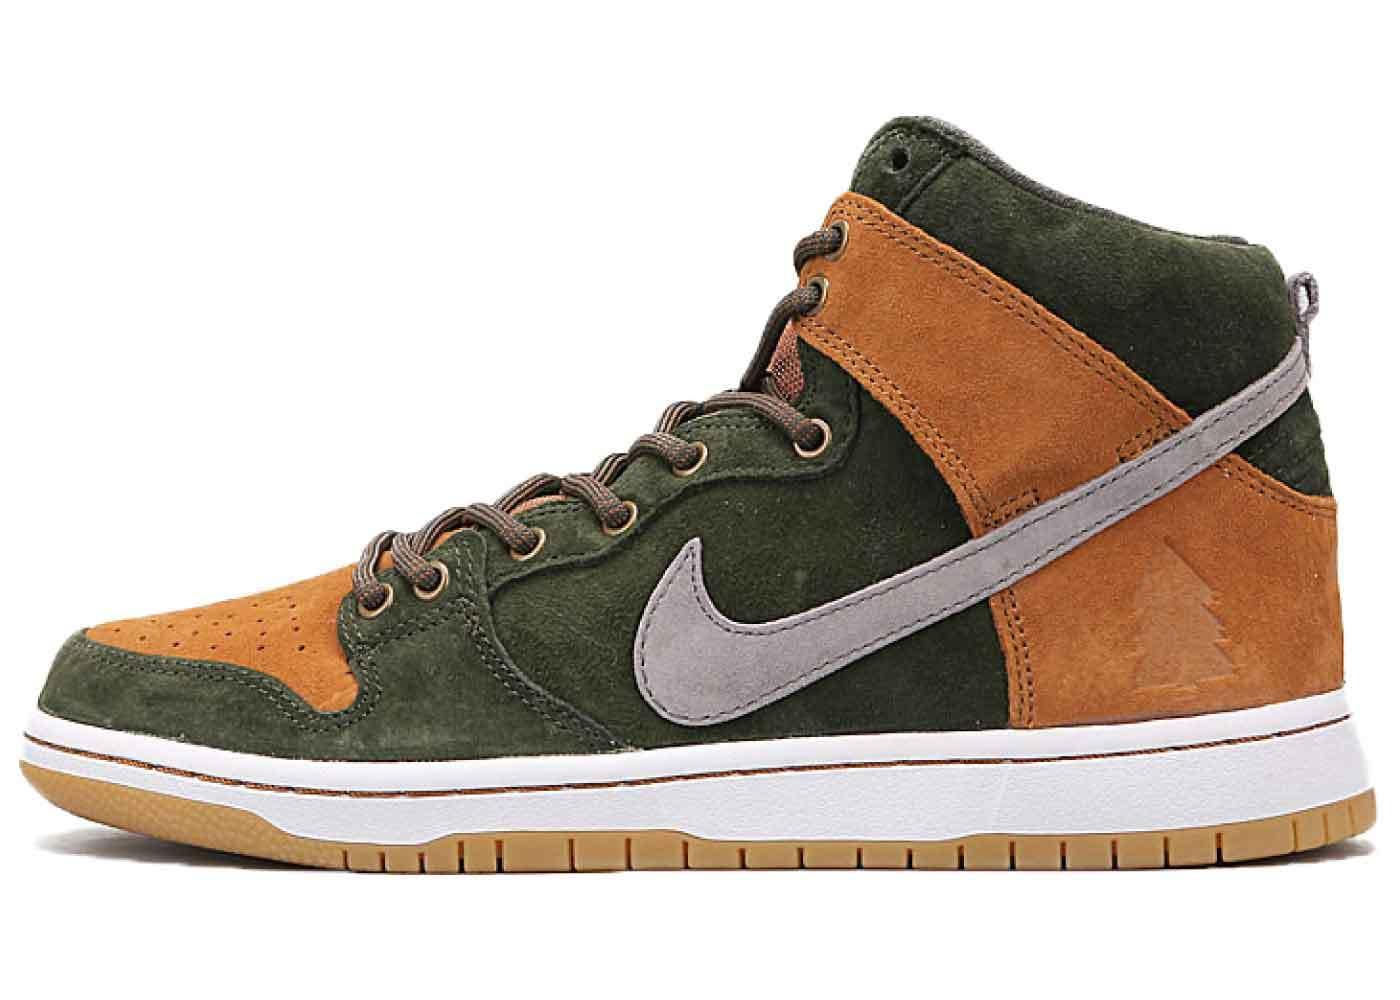 Nike SB Dunk High Homegrown の写真